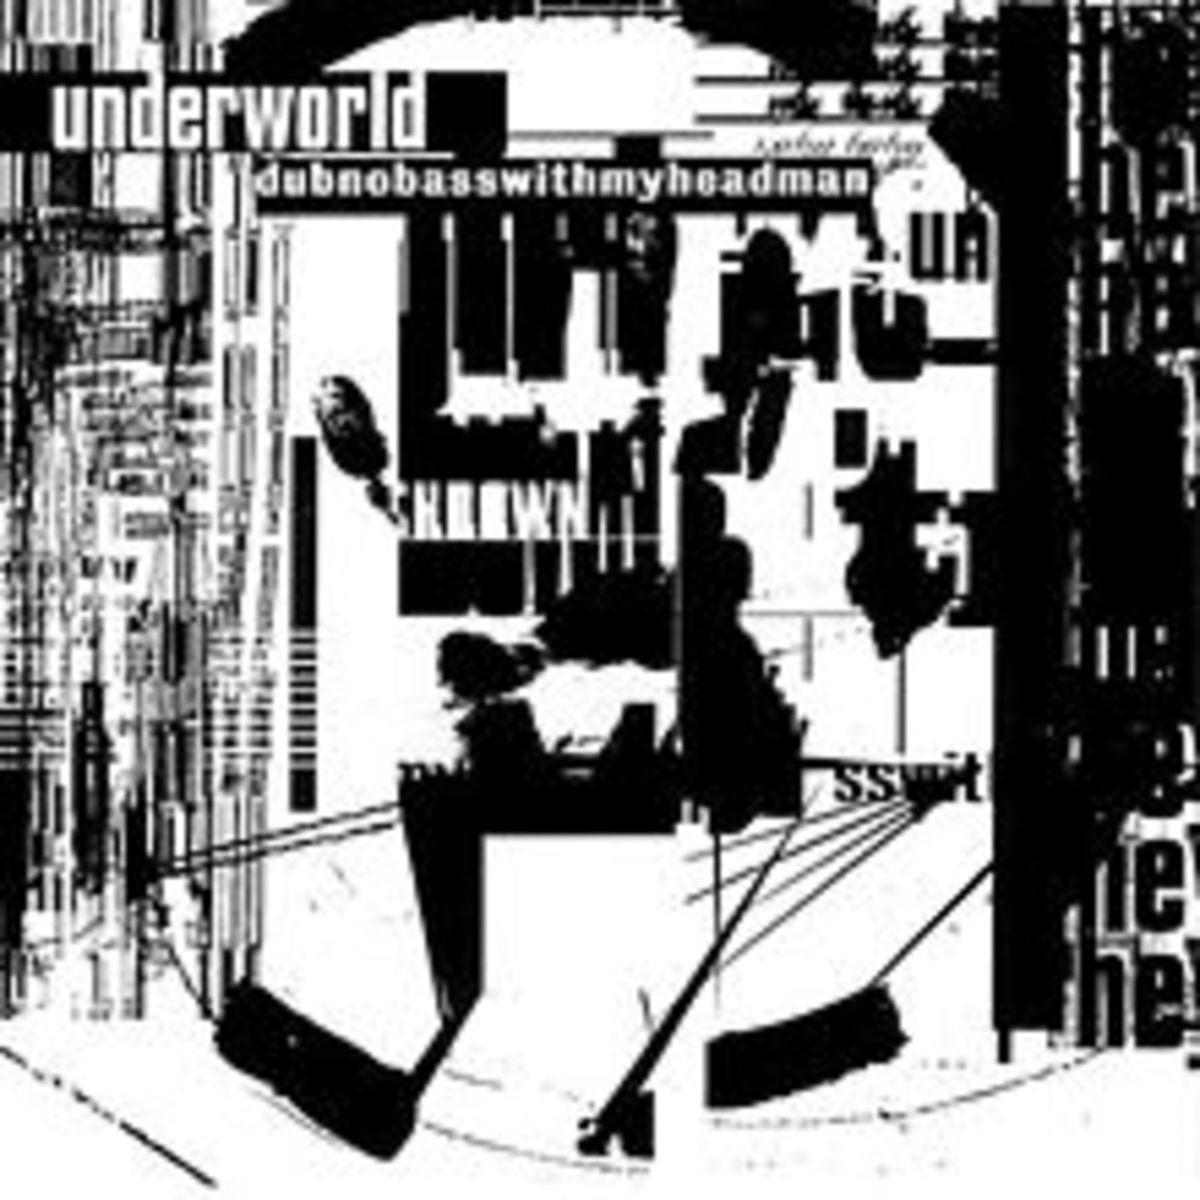 220px-Underworld.dubnobasswithmyheadman